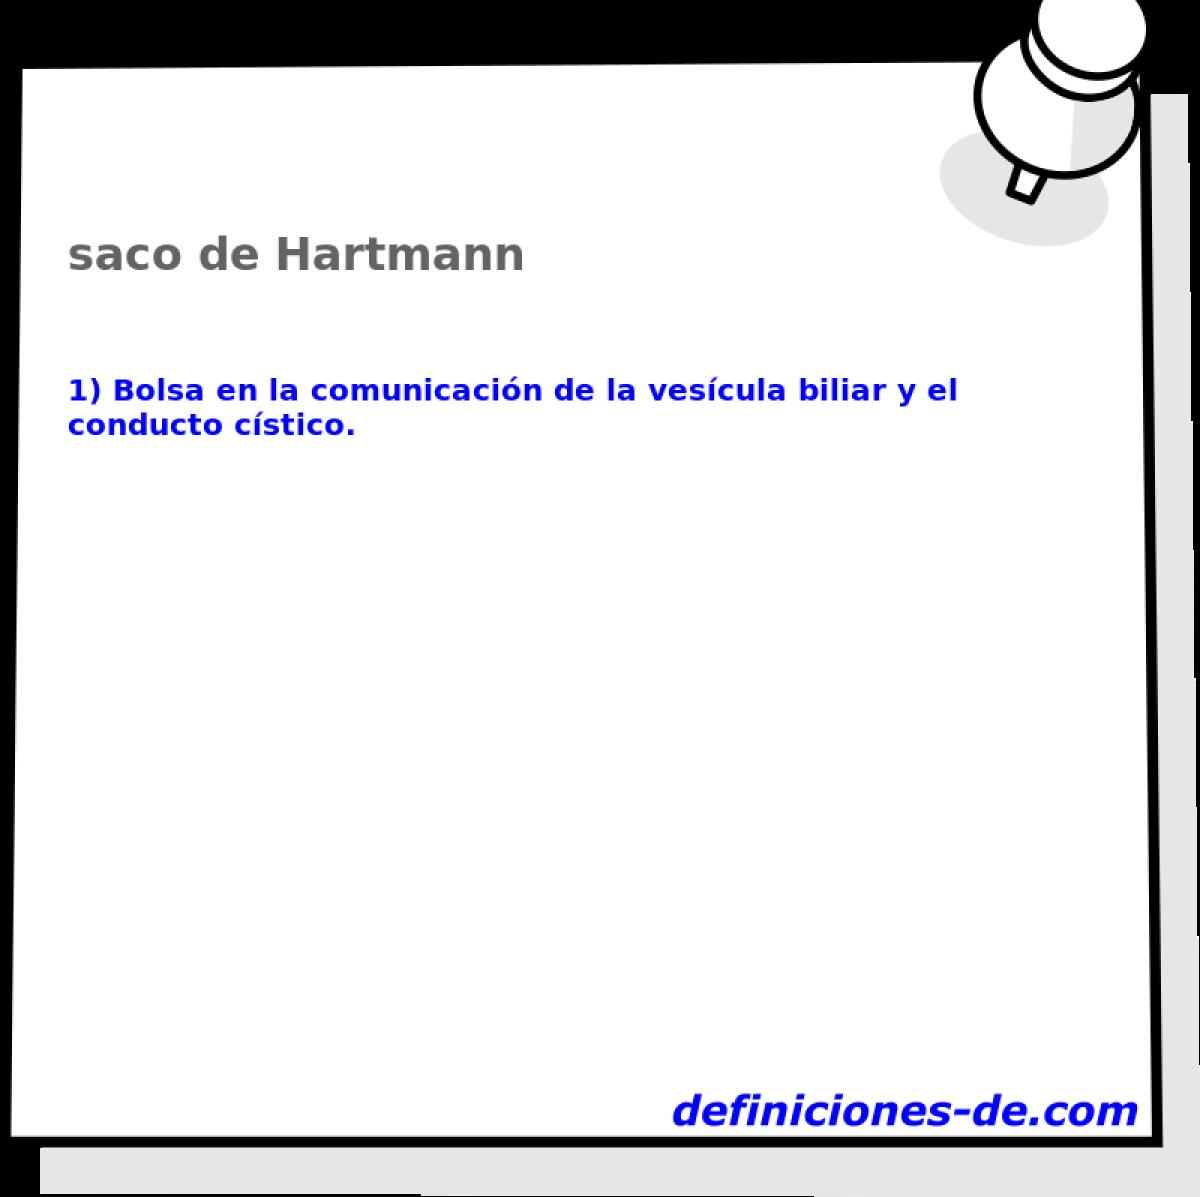 Significa Qué Saco Significa Hartmann De Qué ikTZOuPX